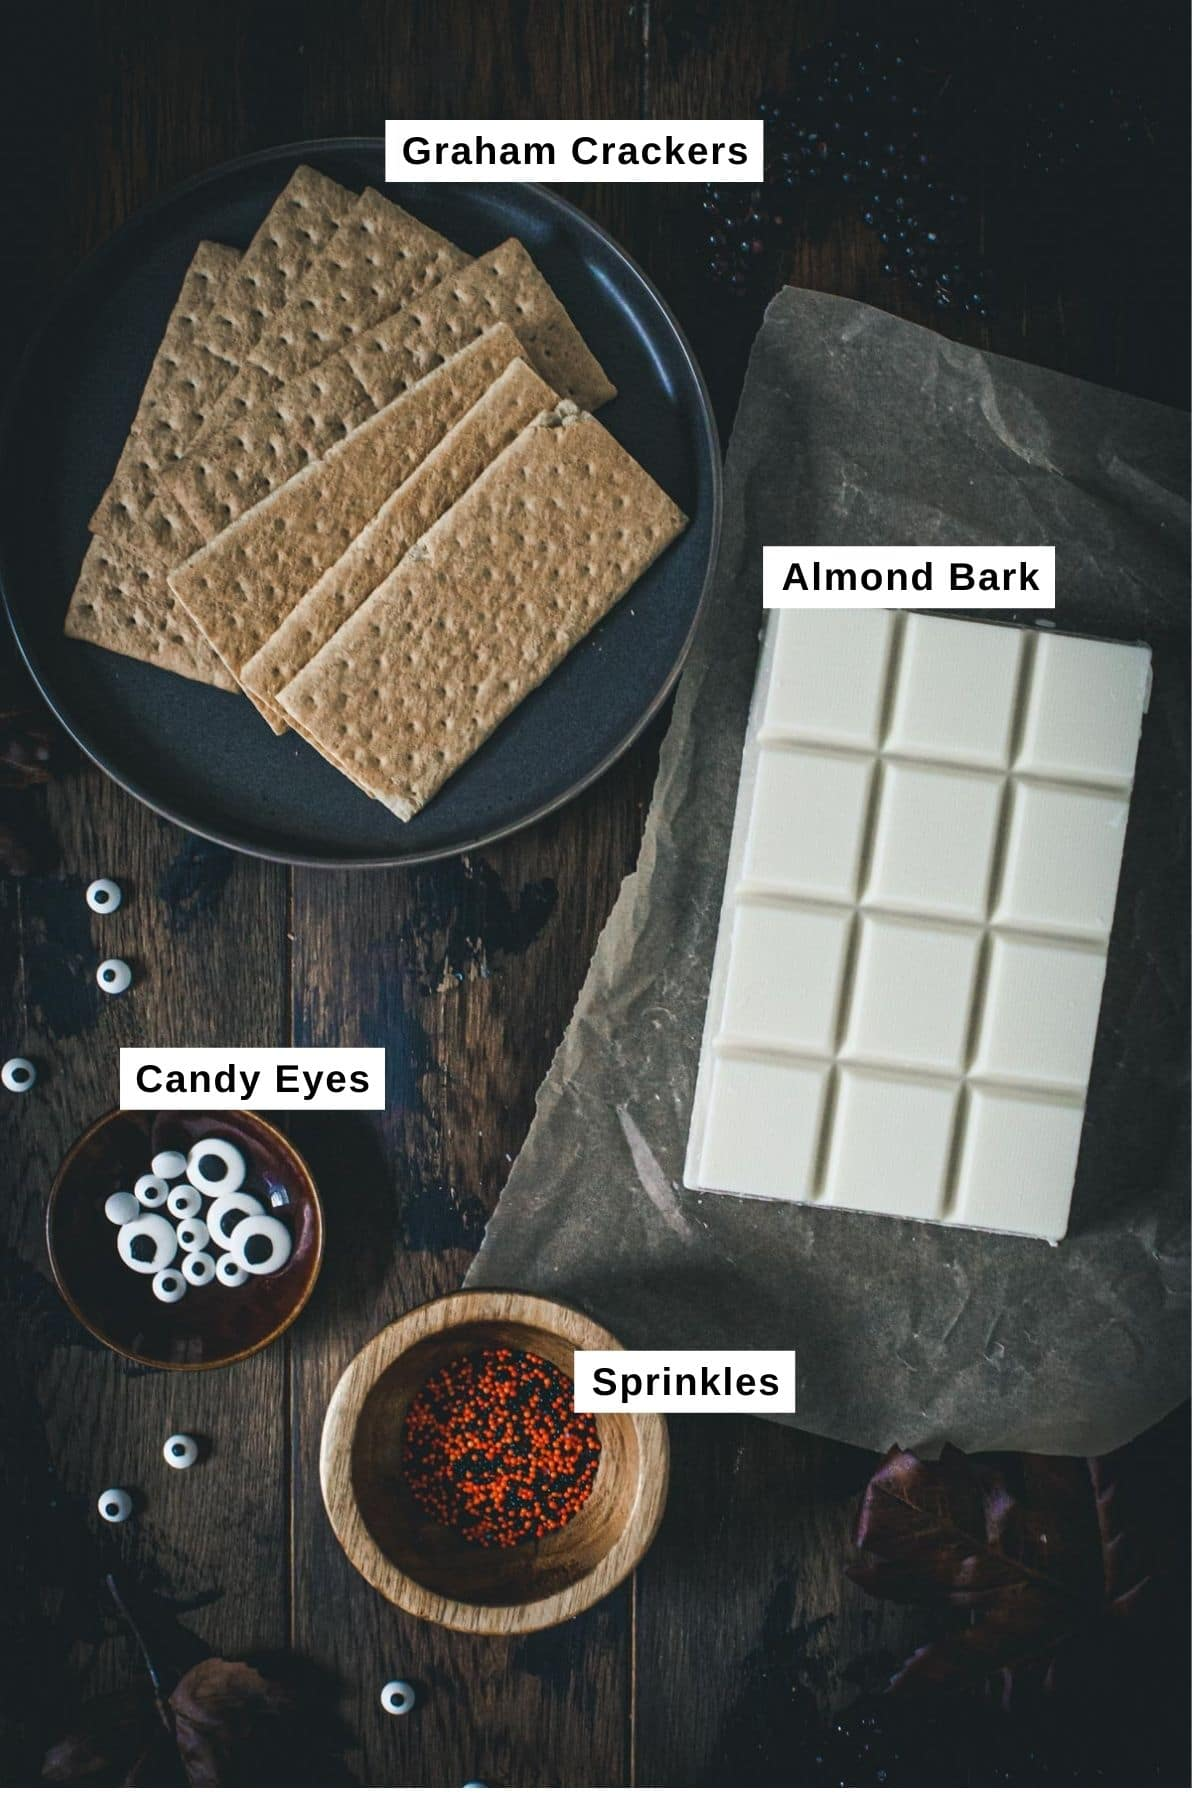 Halloween almond bark ingredients.